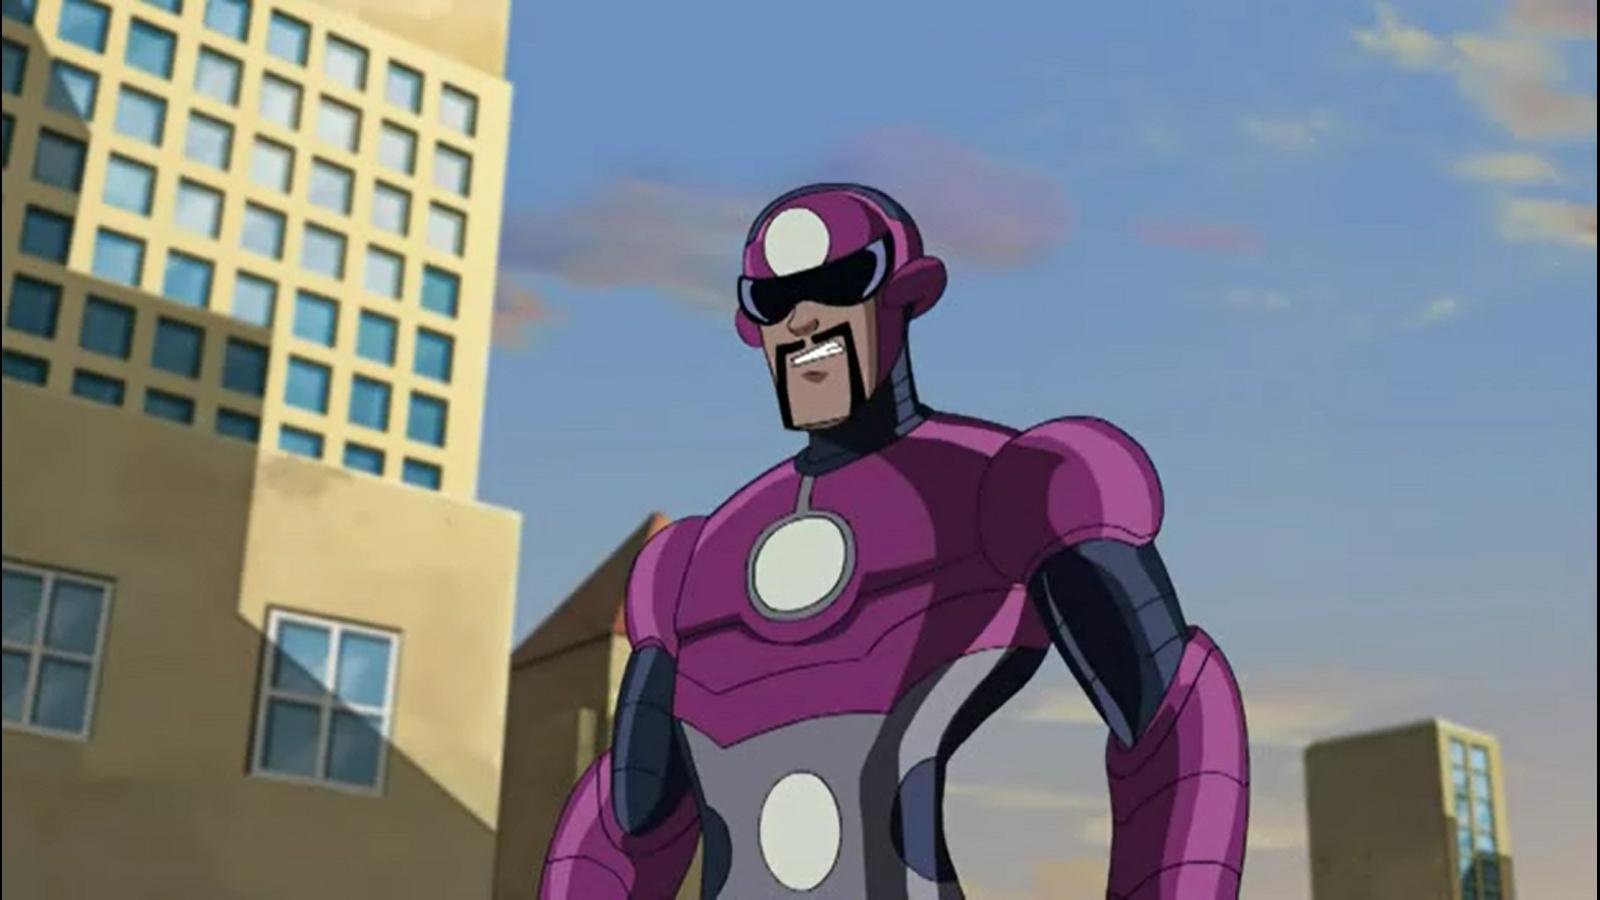 Wizard | Ultimate Spider-Man Animated Series Wiki | FANDOM